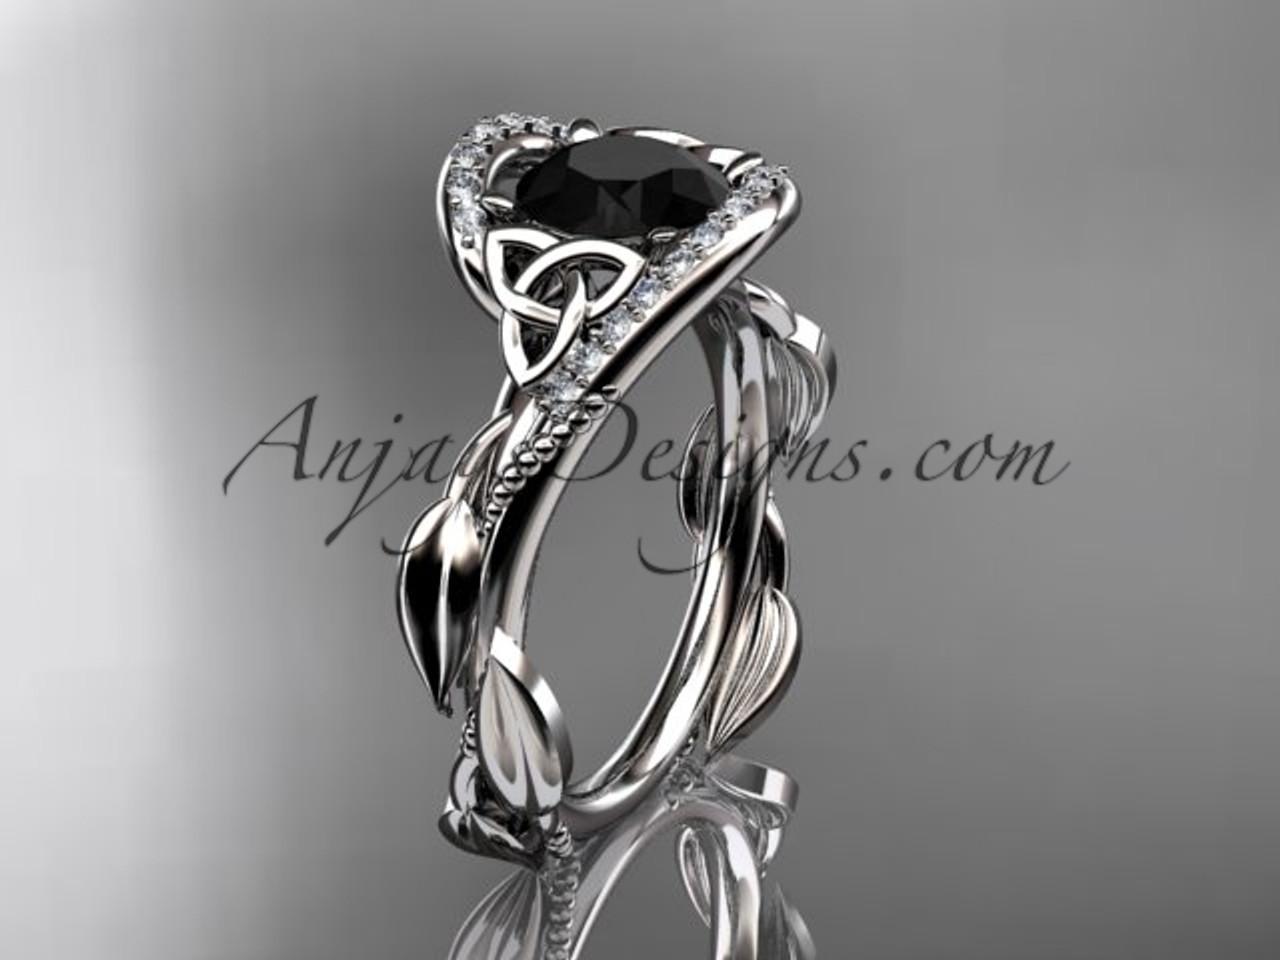 Scottish Celtic Wedding Ring White Gold Black Diamond CT764